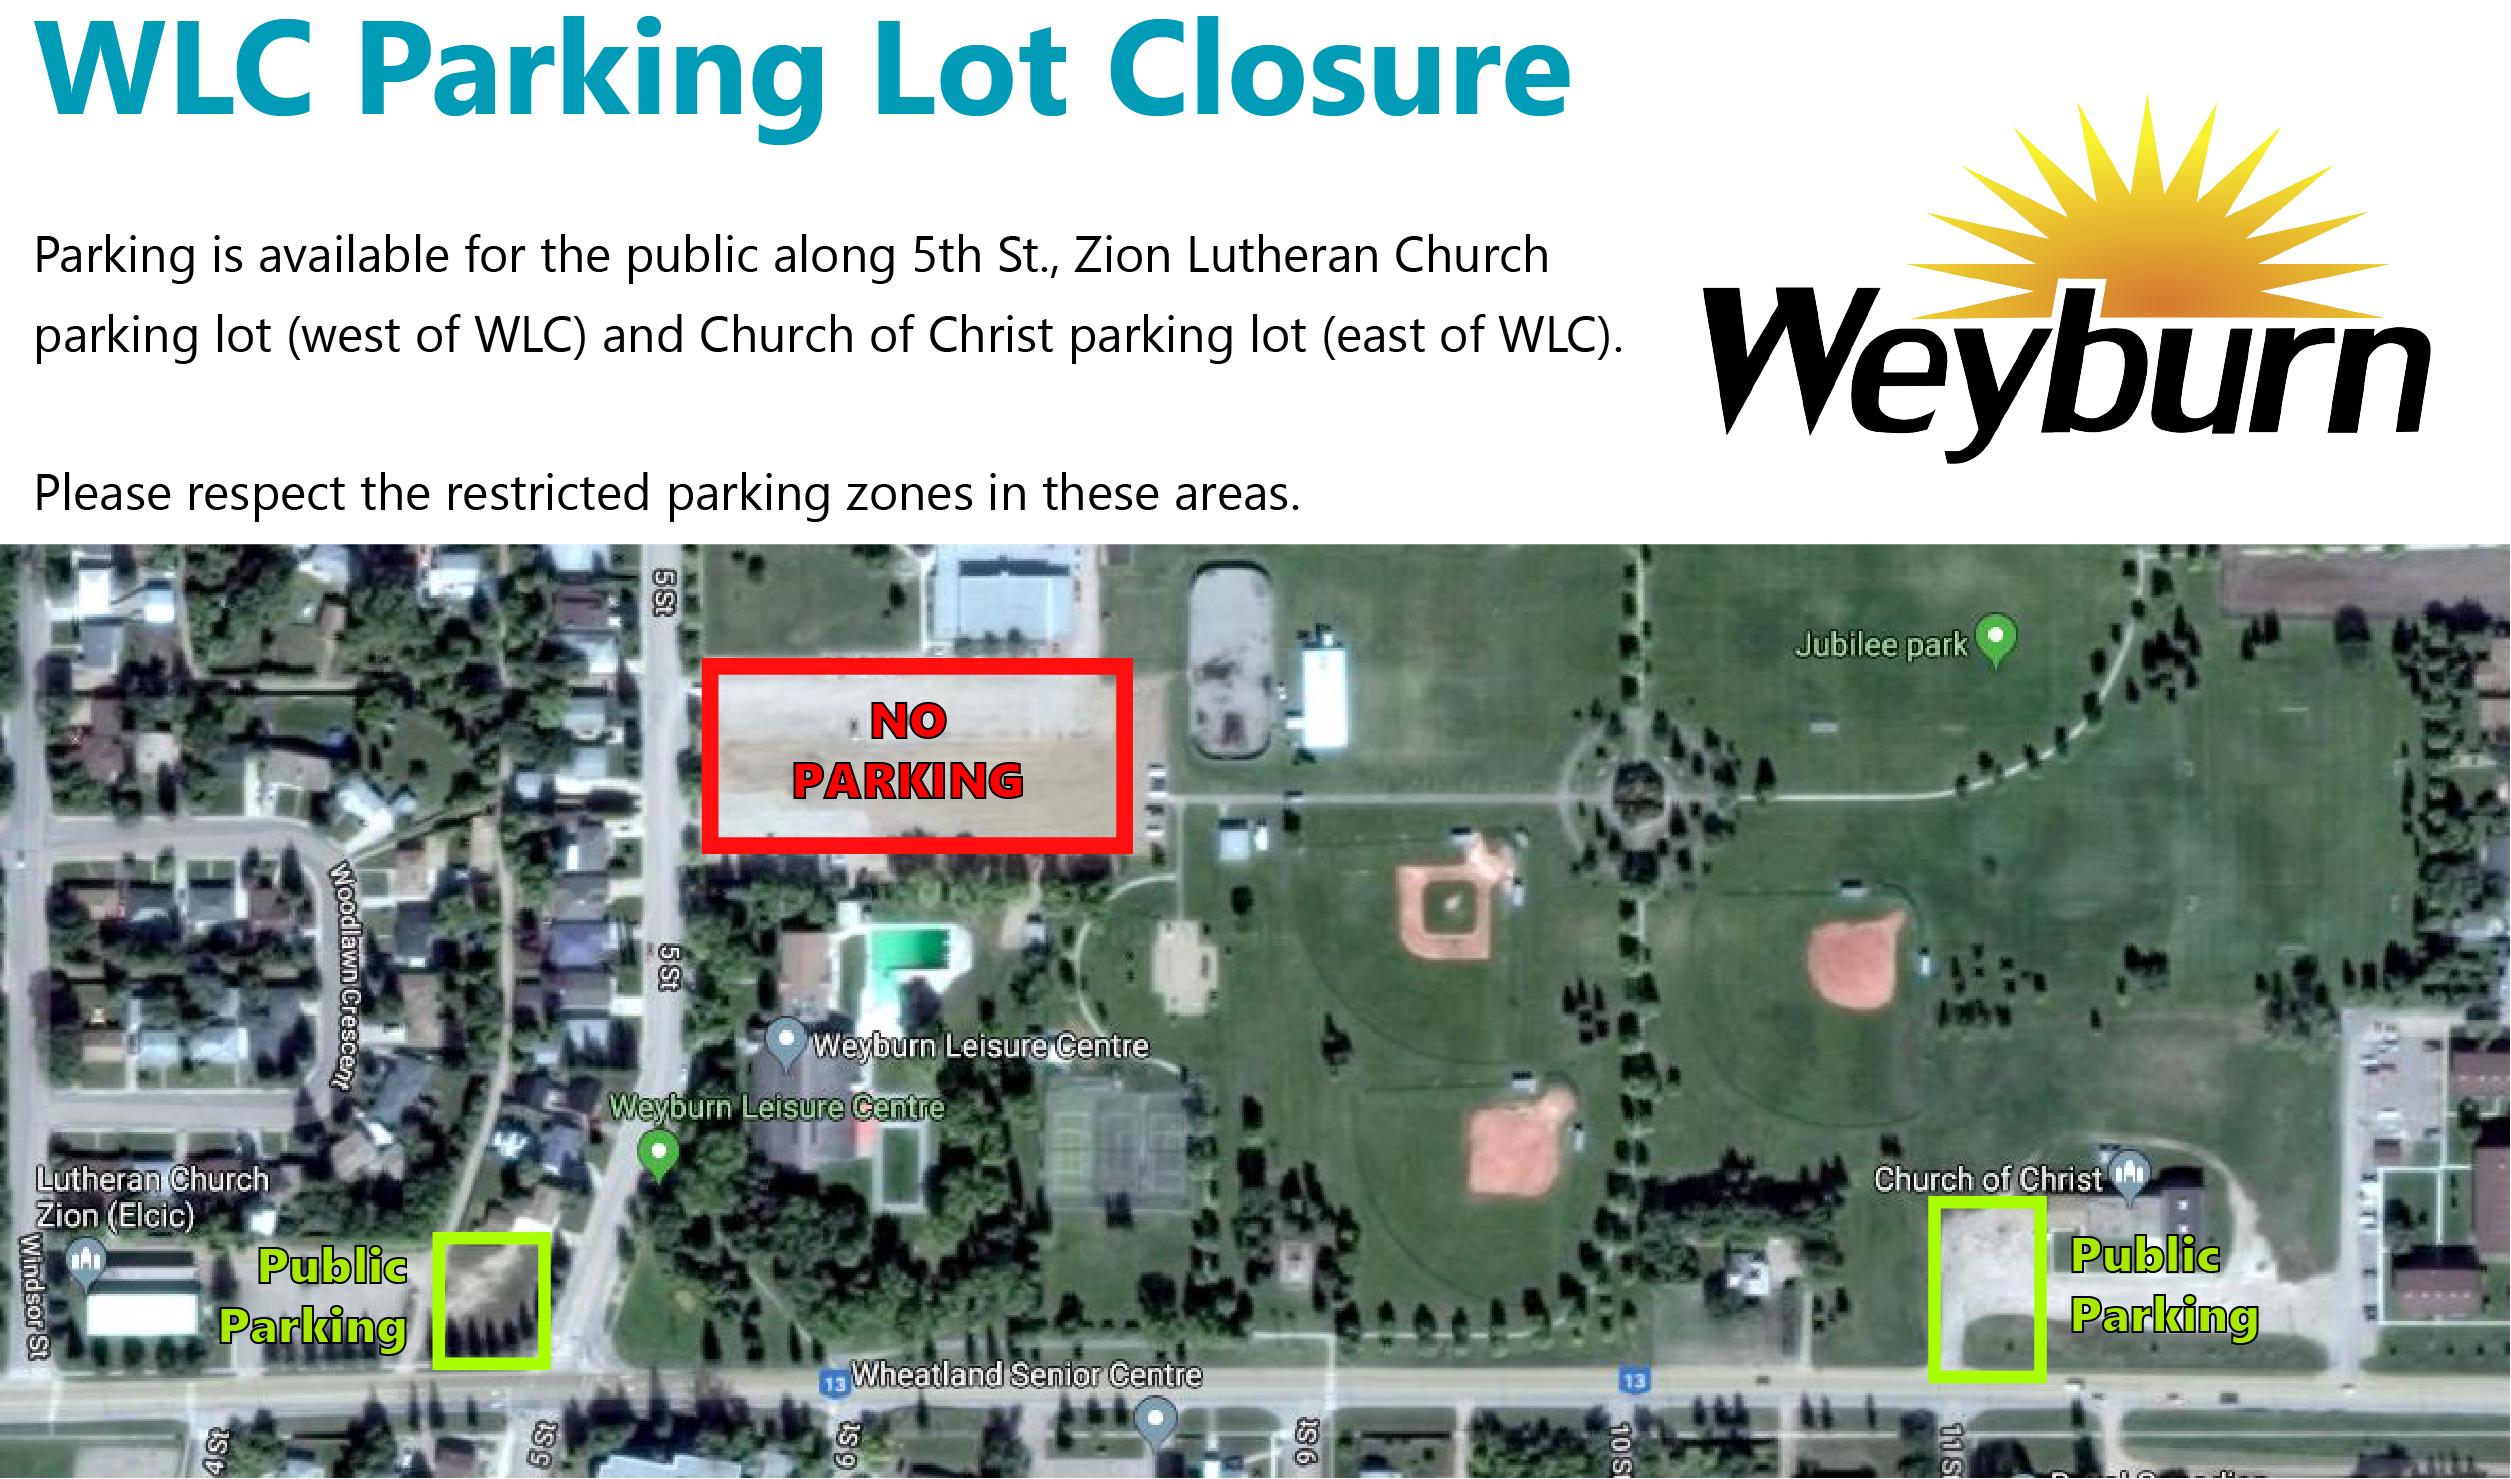 da7d75524a May 13 - WLC Parking Lot Closure - Weyburn, Saskatchewan